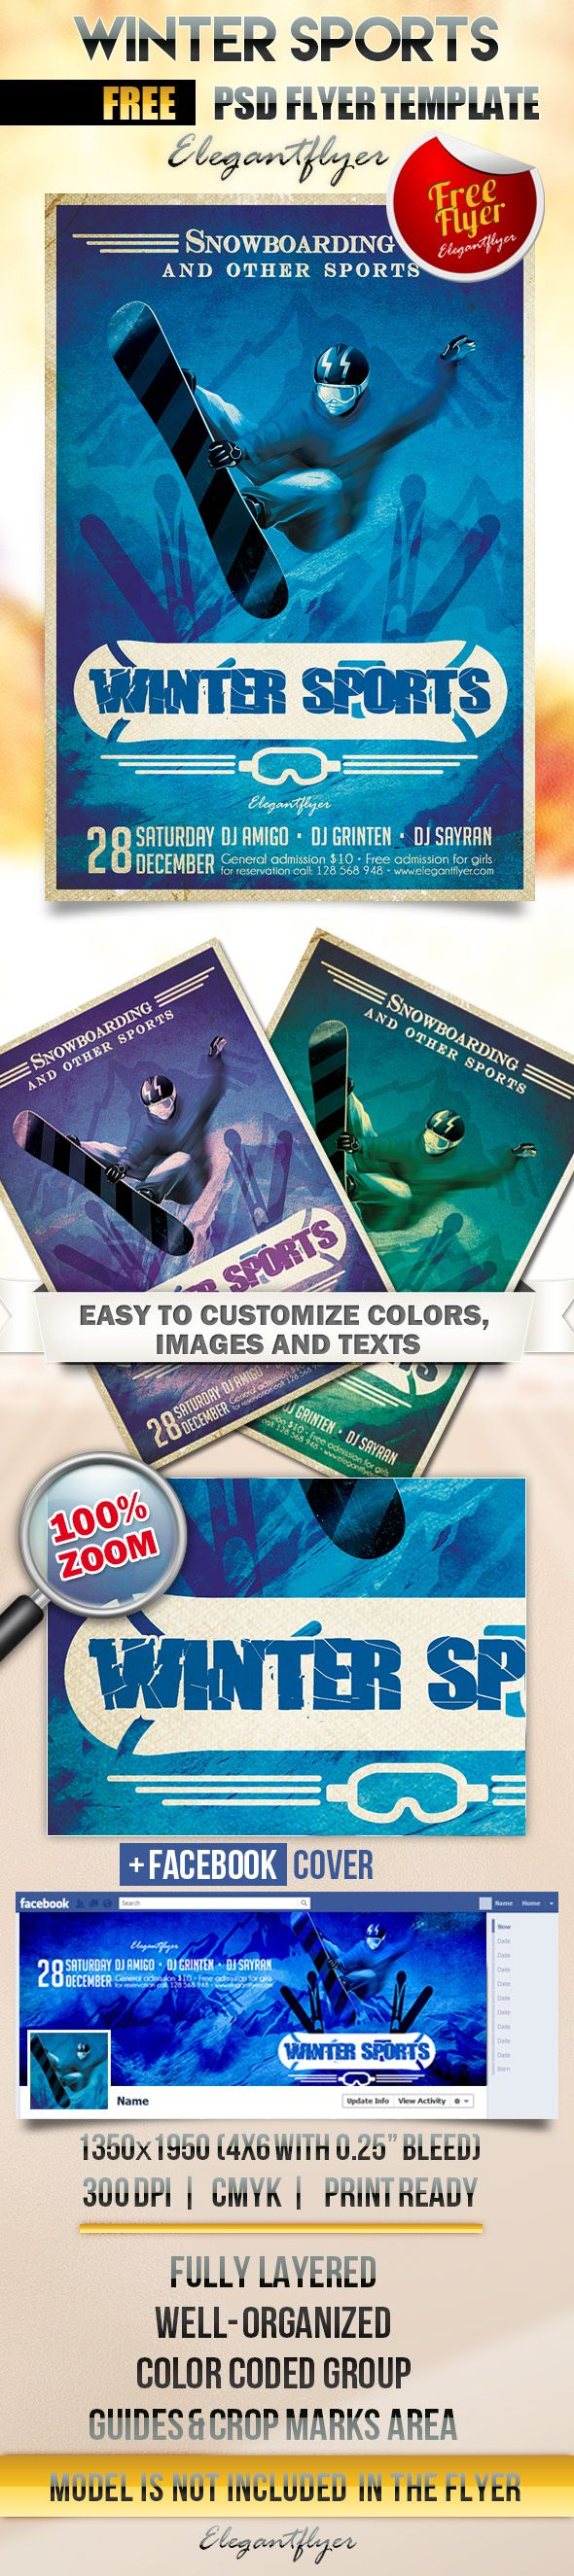 11 best sport flyer images on pinterest event flyers winter sports flyer psd template facebook cover httpselegantflyer fandeluxe Gallery